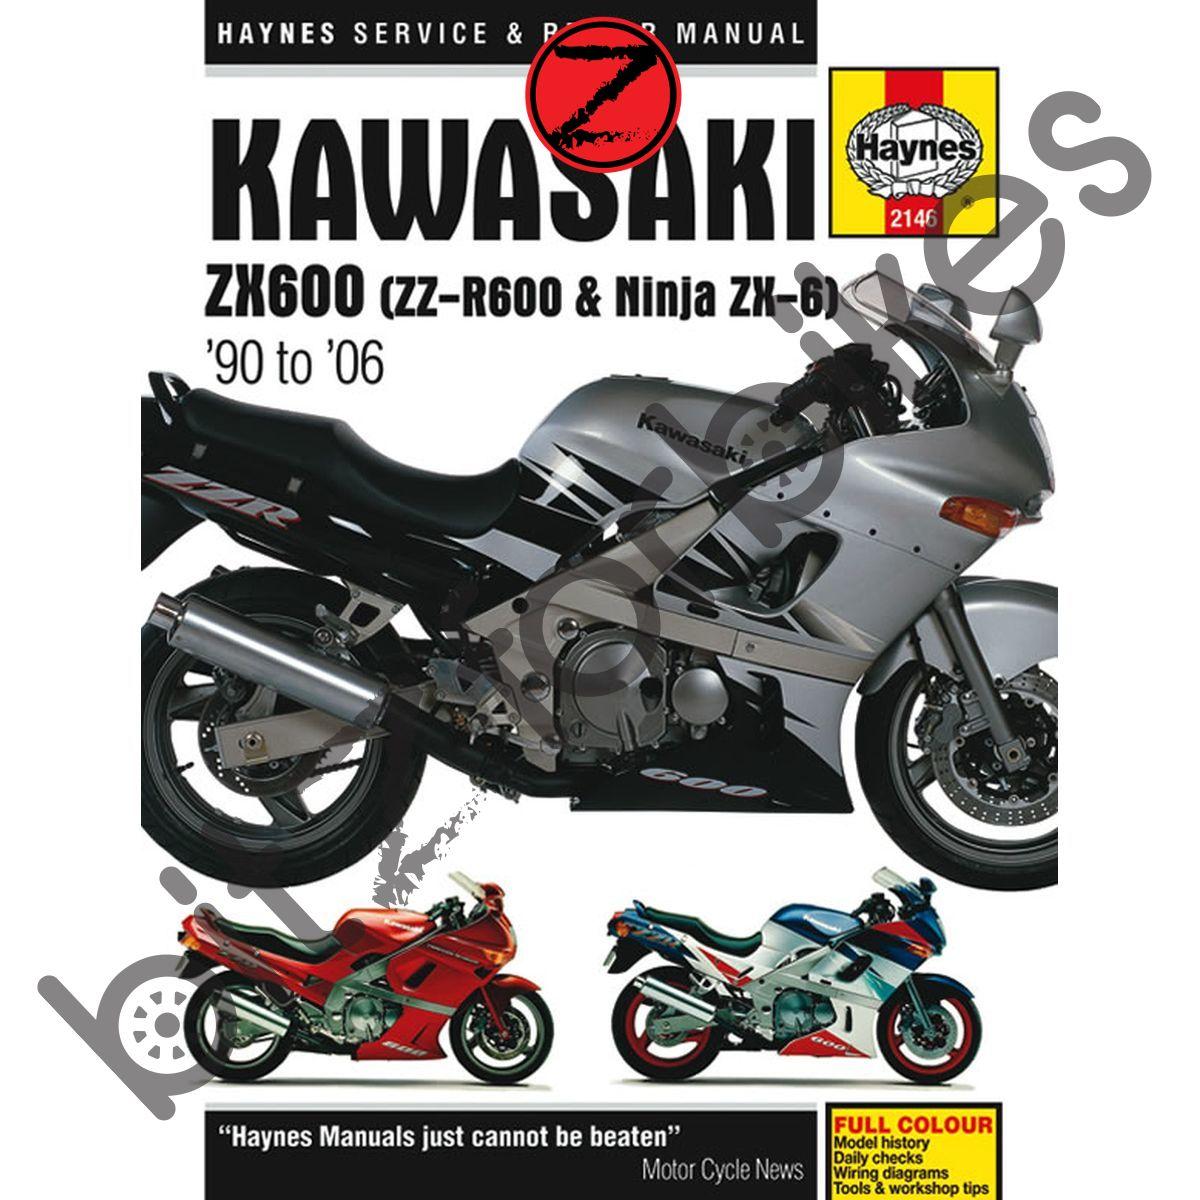 WRG-8282] 2006 Kawasaki Zzr600 Wiring Diagram on